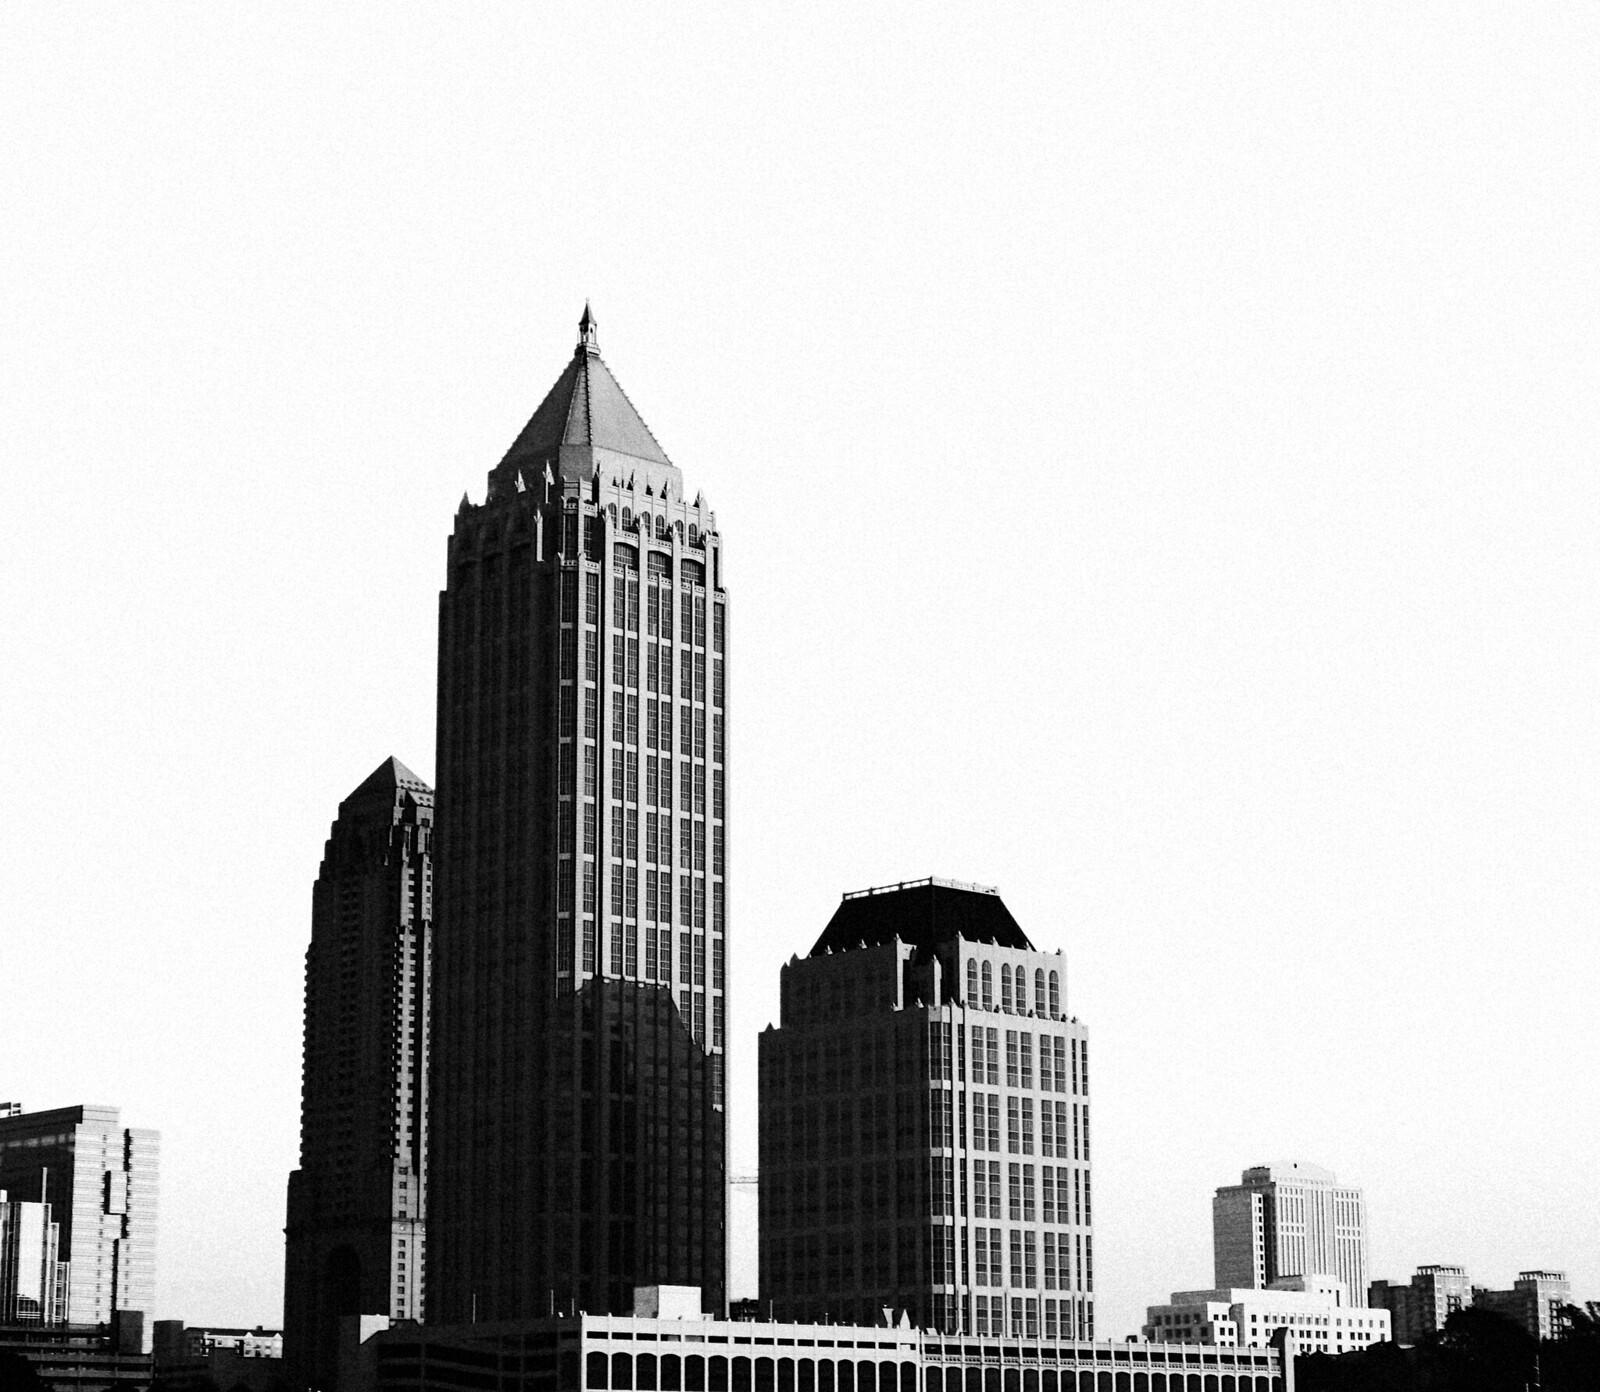 The Marriott Four Seasons, One Atlantic Center and Atlantic Center Plaza, Midtown Atlanta, 2007